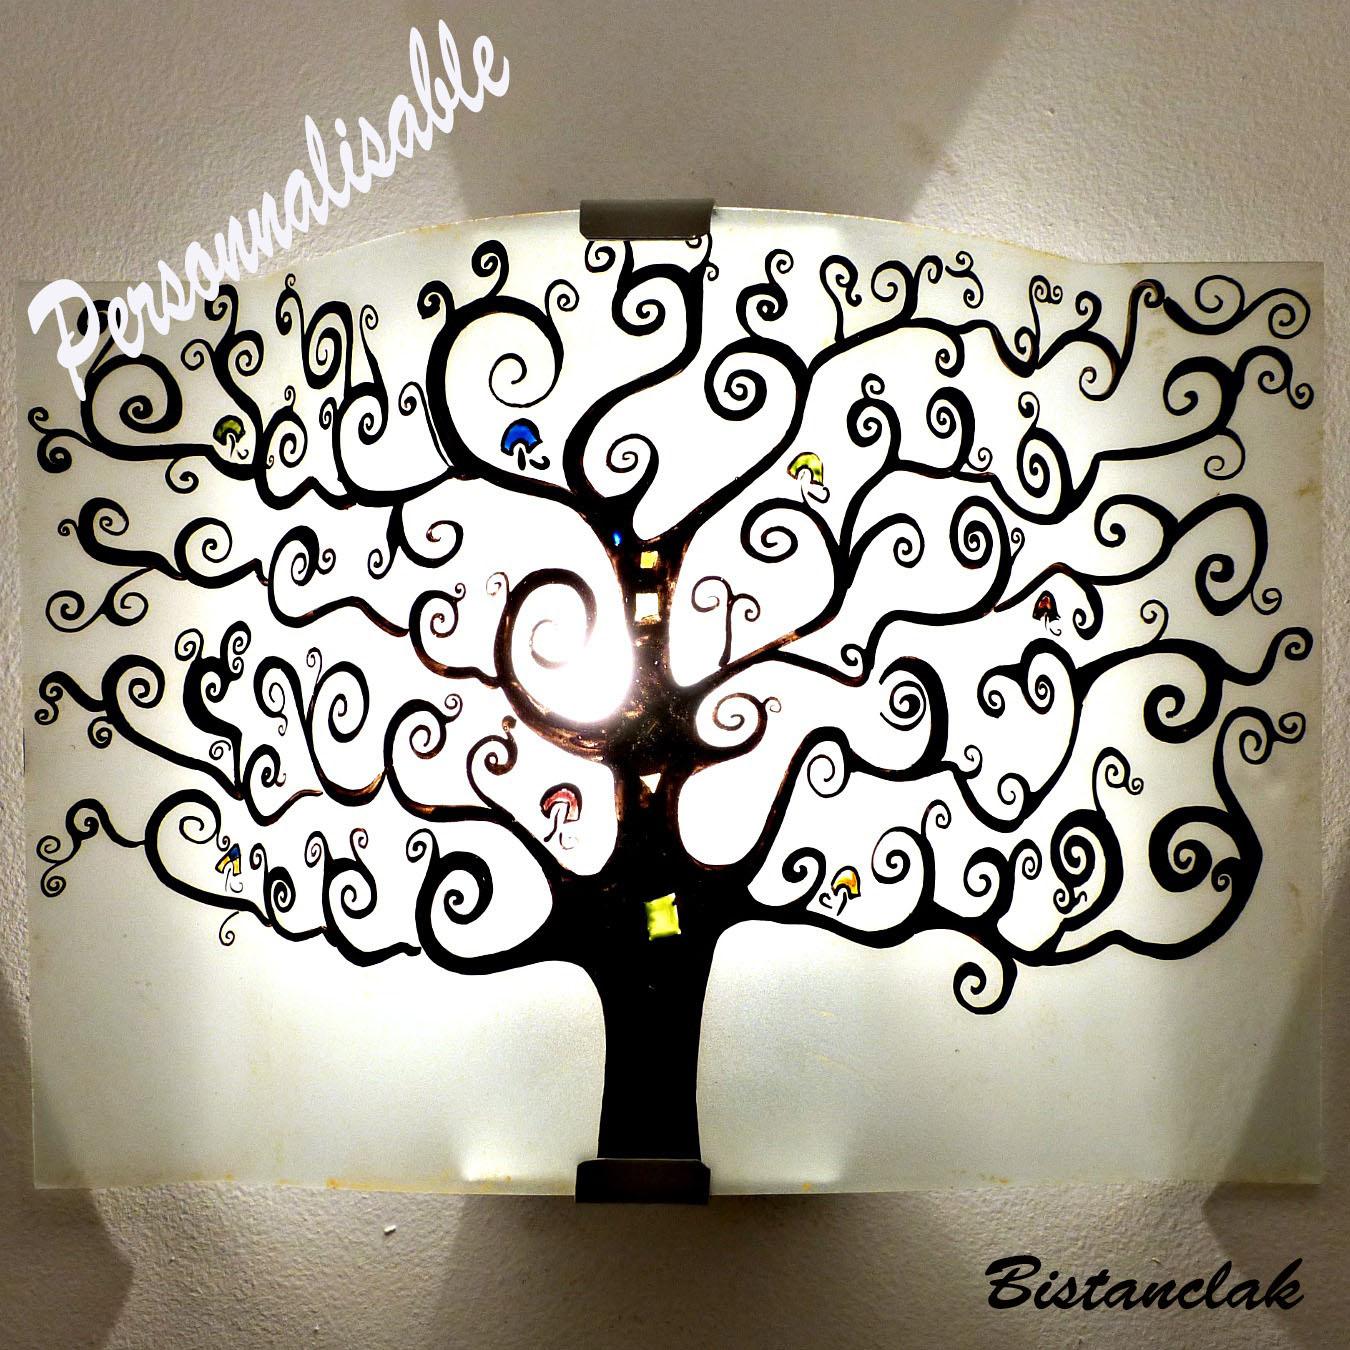 applique d corative personnaliser motif arbre de vie. Black Bedroom Furniture Sets. Home Design Ideas